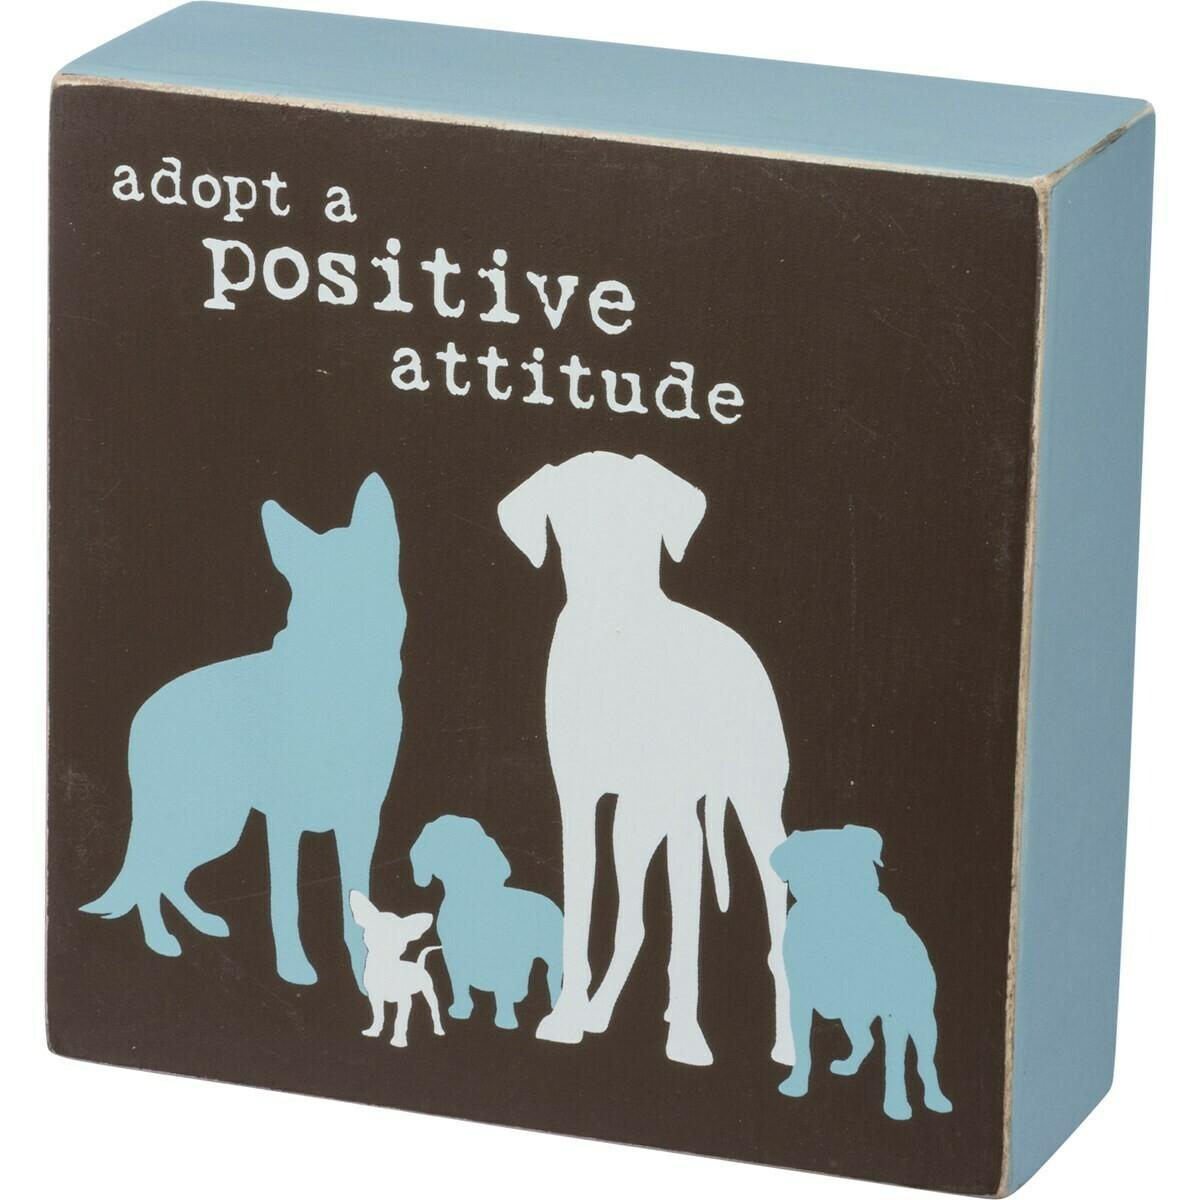 'Adopt a Positive Attitude' Wood Box Sign